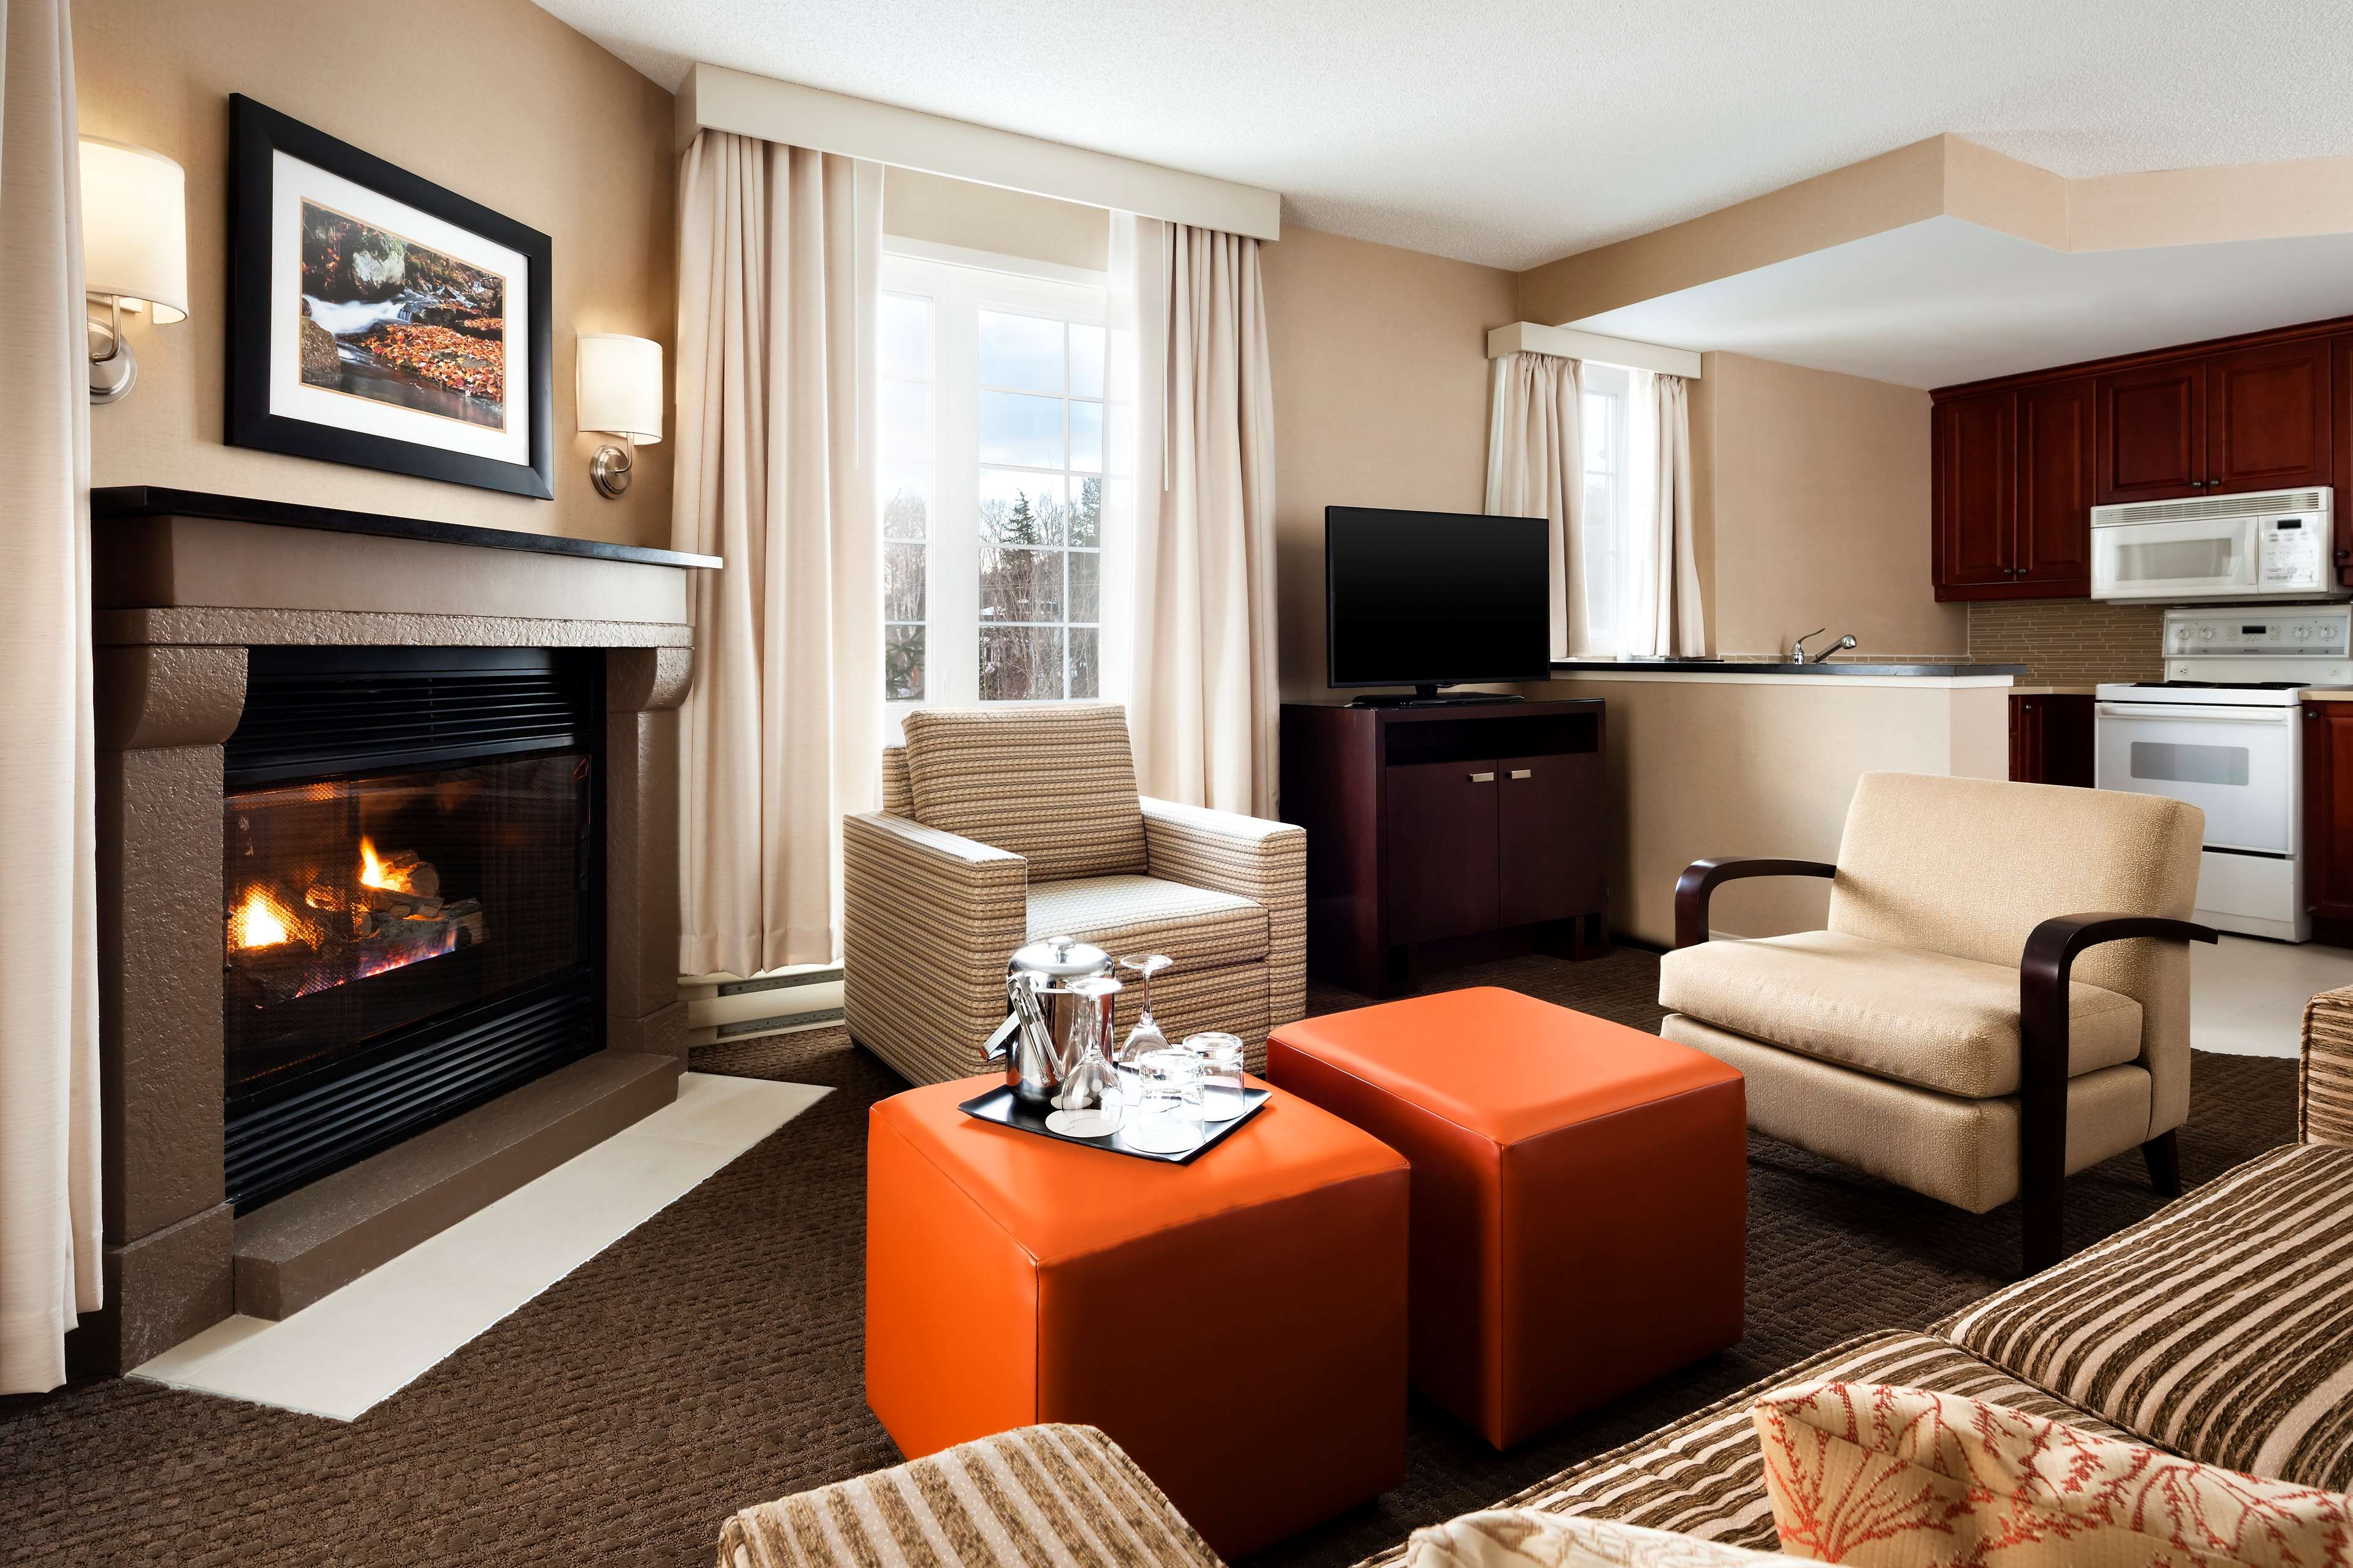 Le Westin Resort & Spa, Tremblant, Quebec à Mont Tremblant: Living Areas - Two Bedrooms Suite